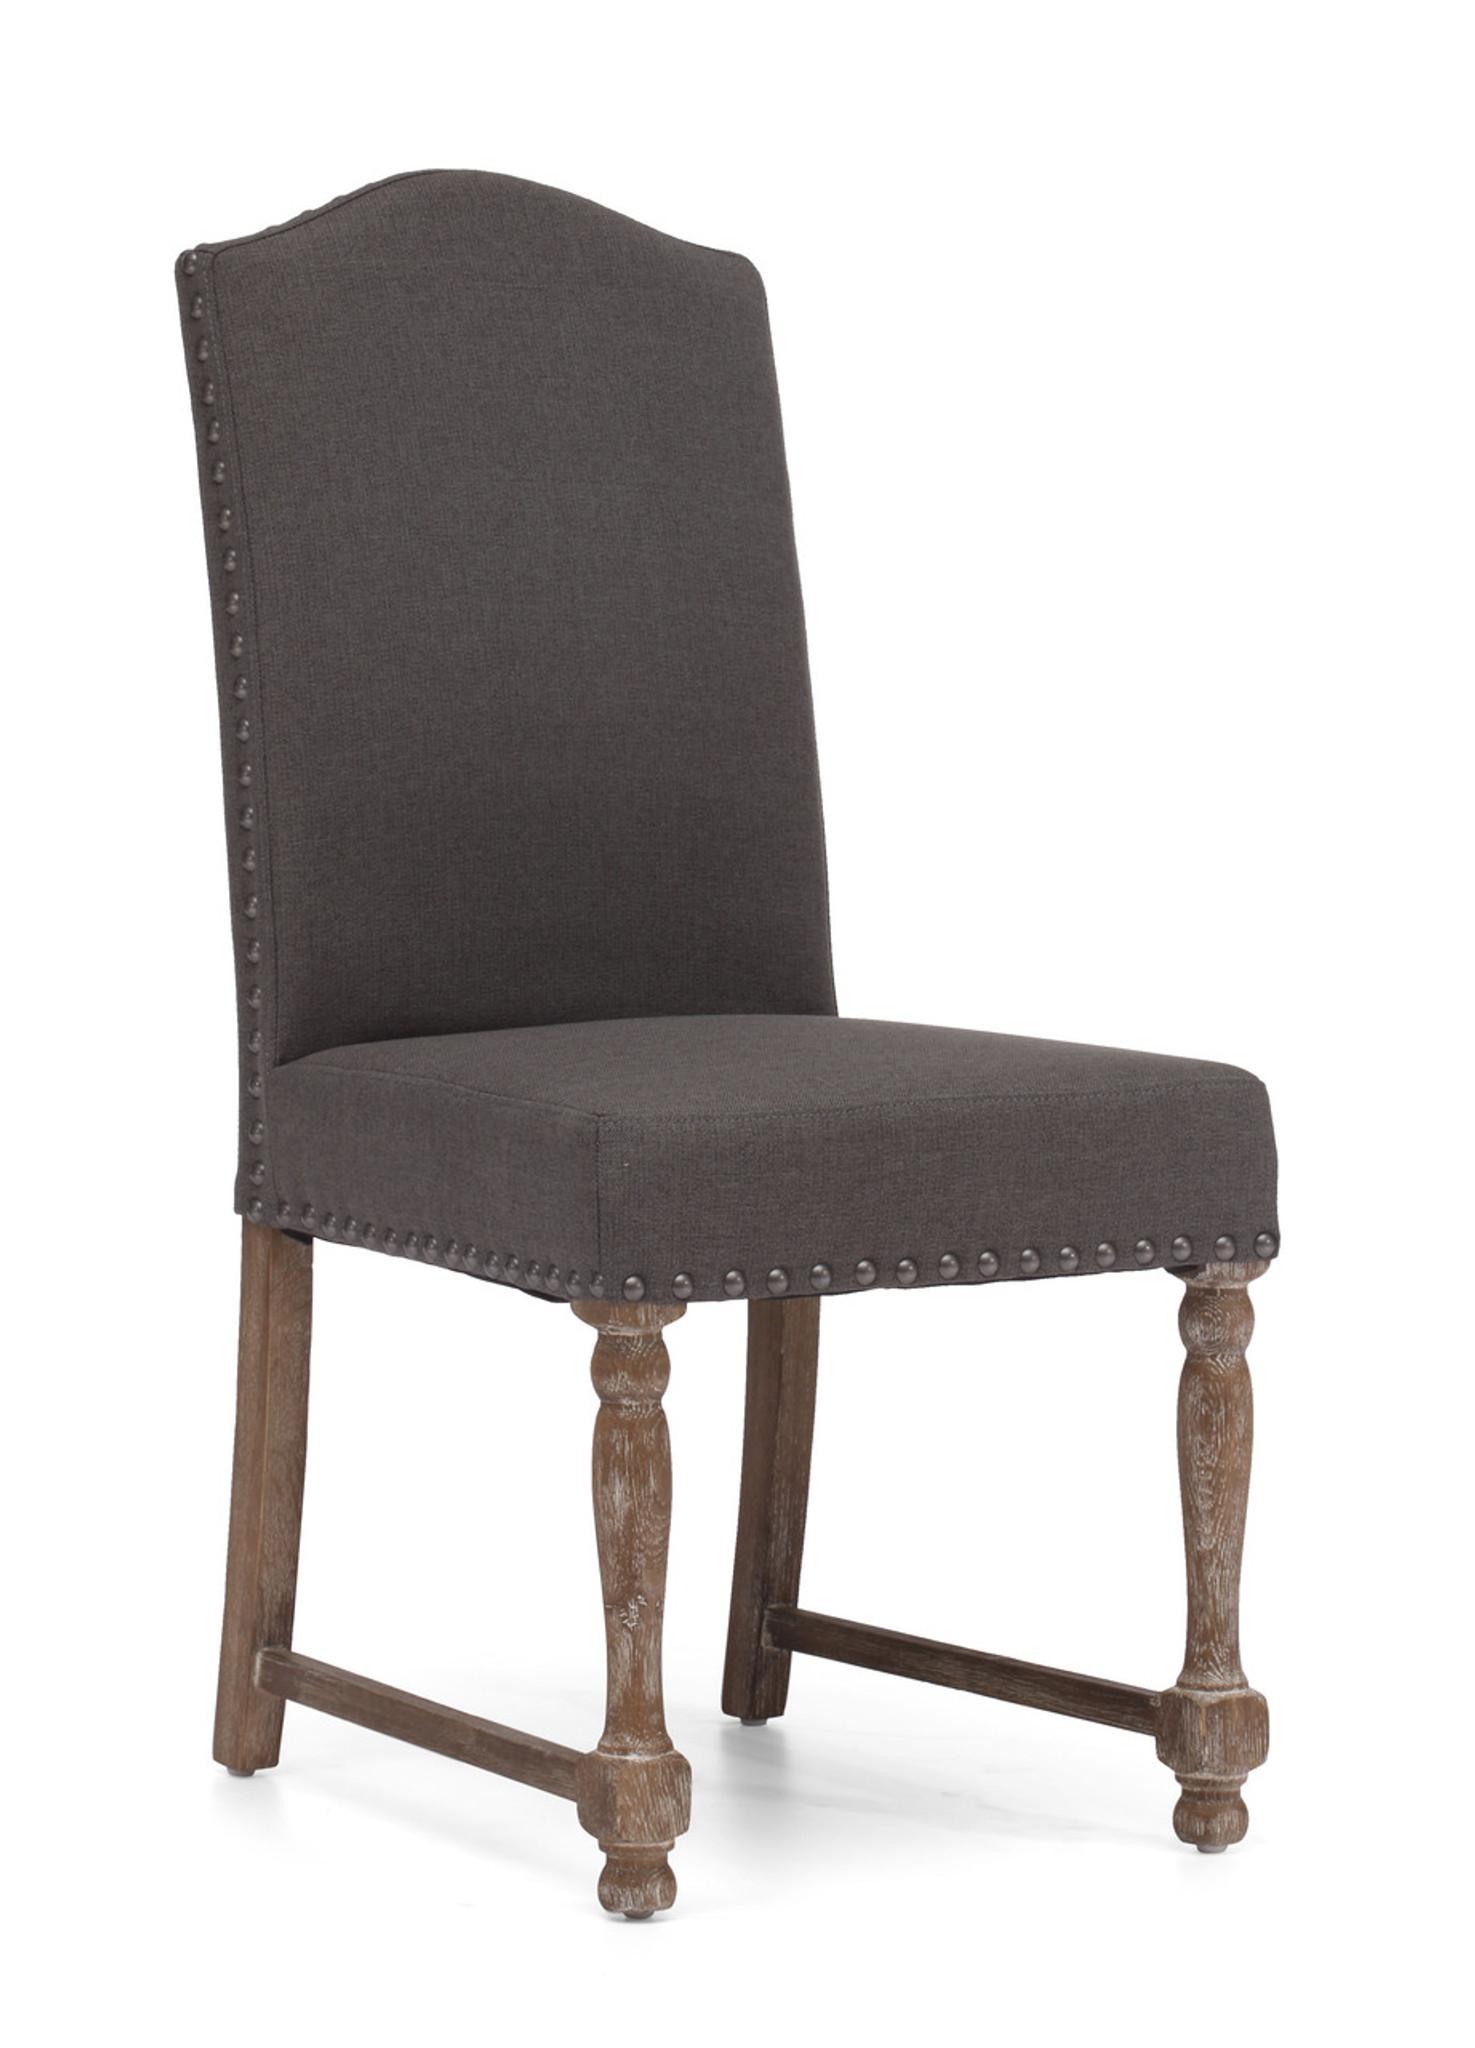 98073 Richmond Chair Charcoal Gray 816226021879 Seating Modern Charcoal  Gray Chair By Zuo Modern Kassa Mall